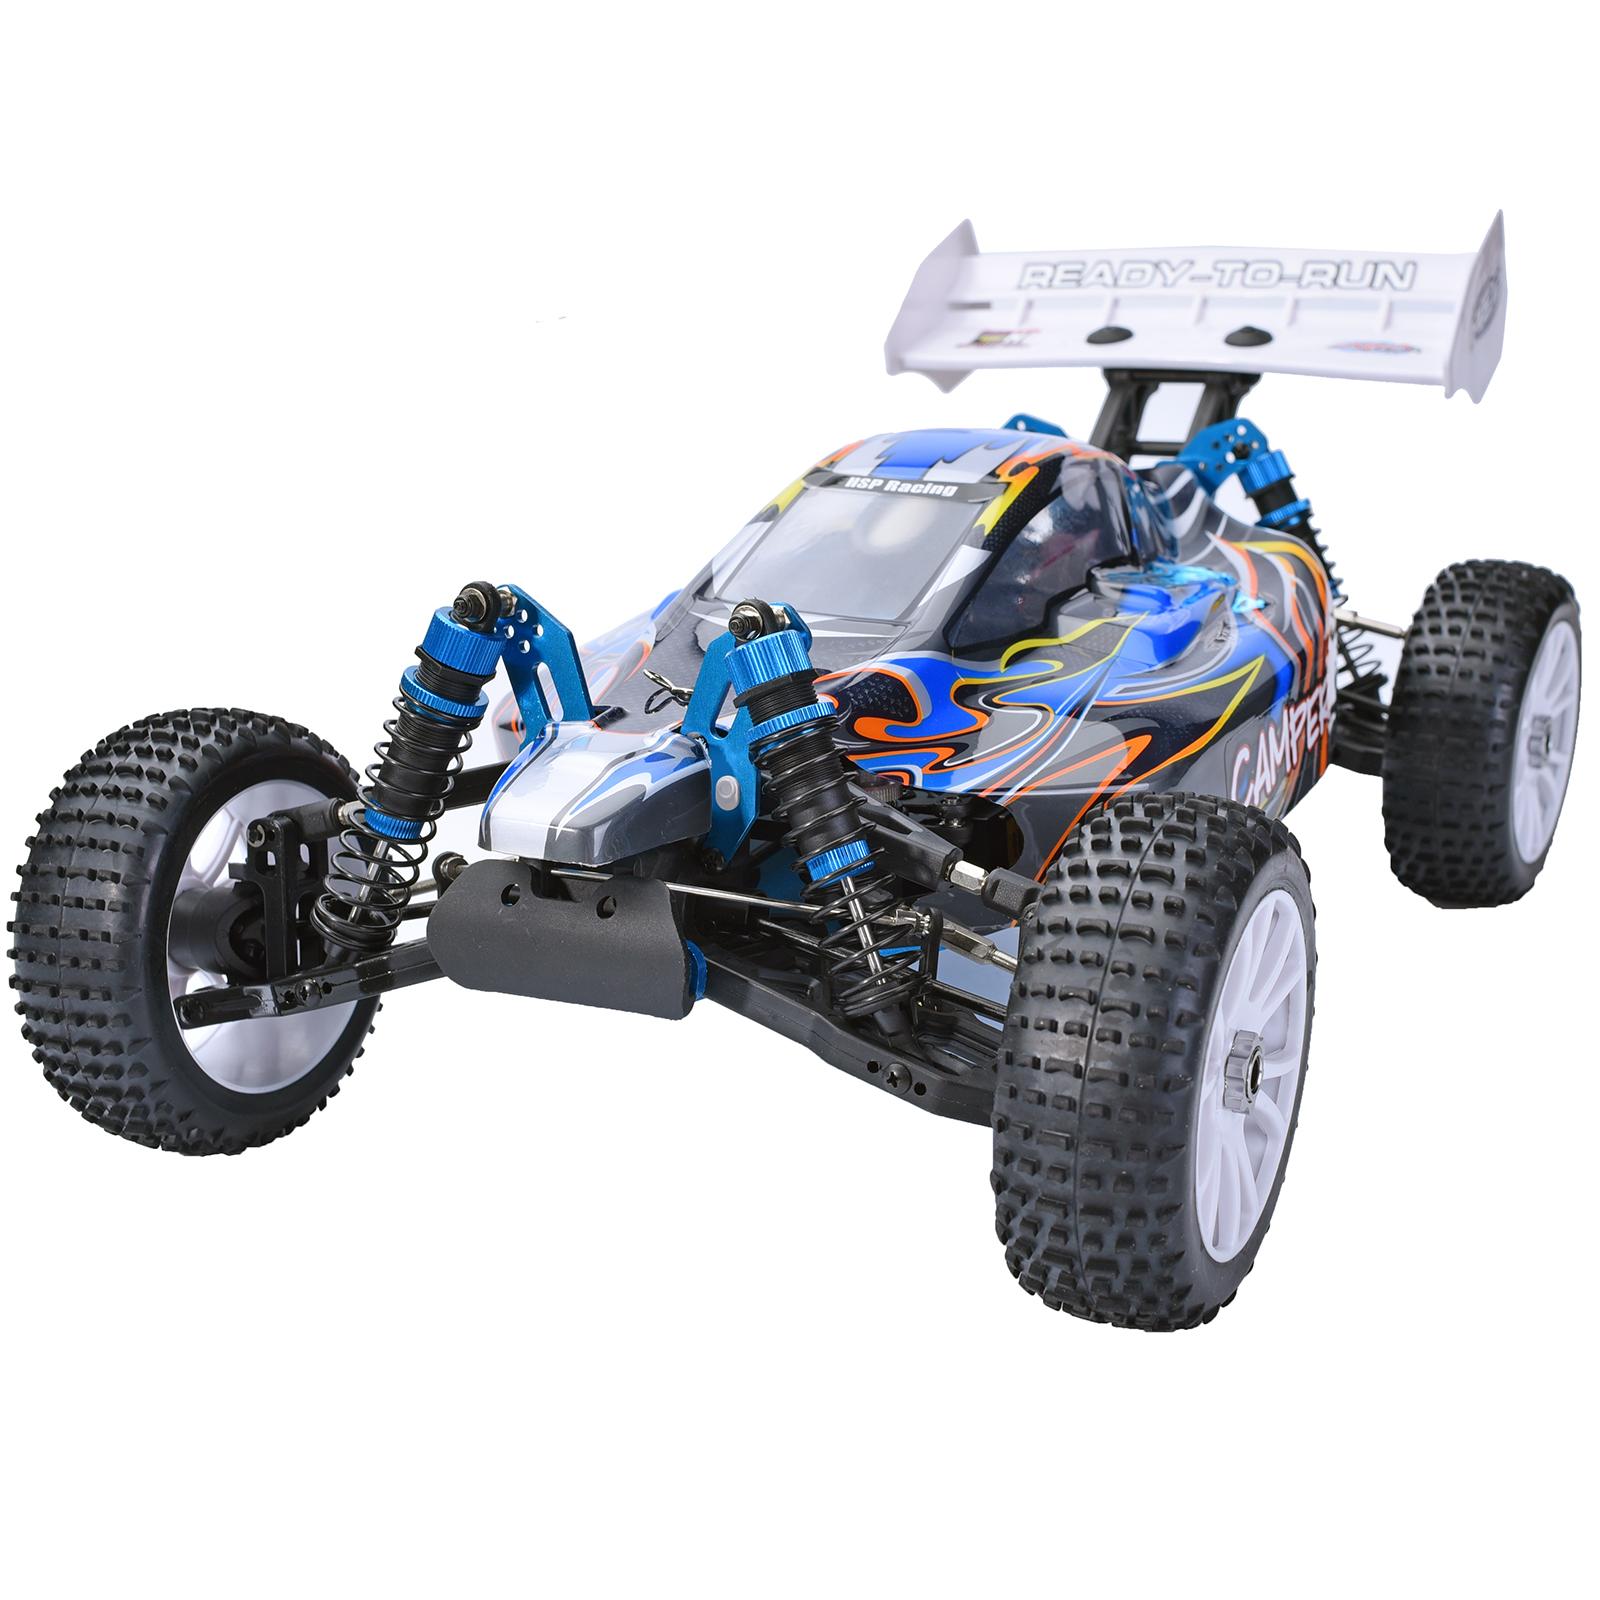 HSP Rc Car 1 8 Scale 4wd Nitro Remote Control Troian f Road Buggy